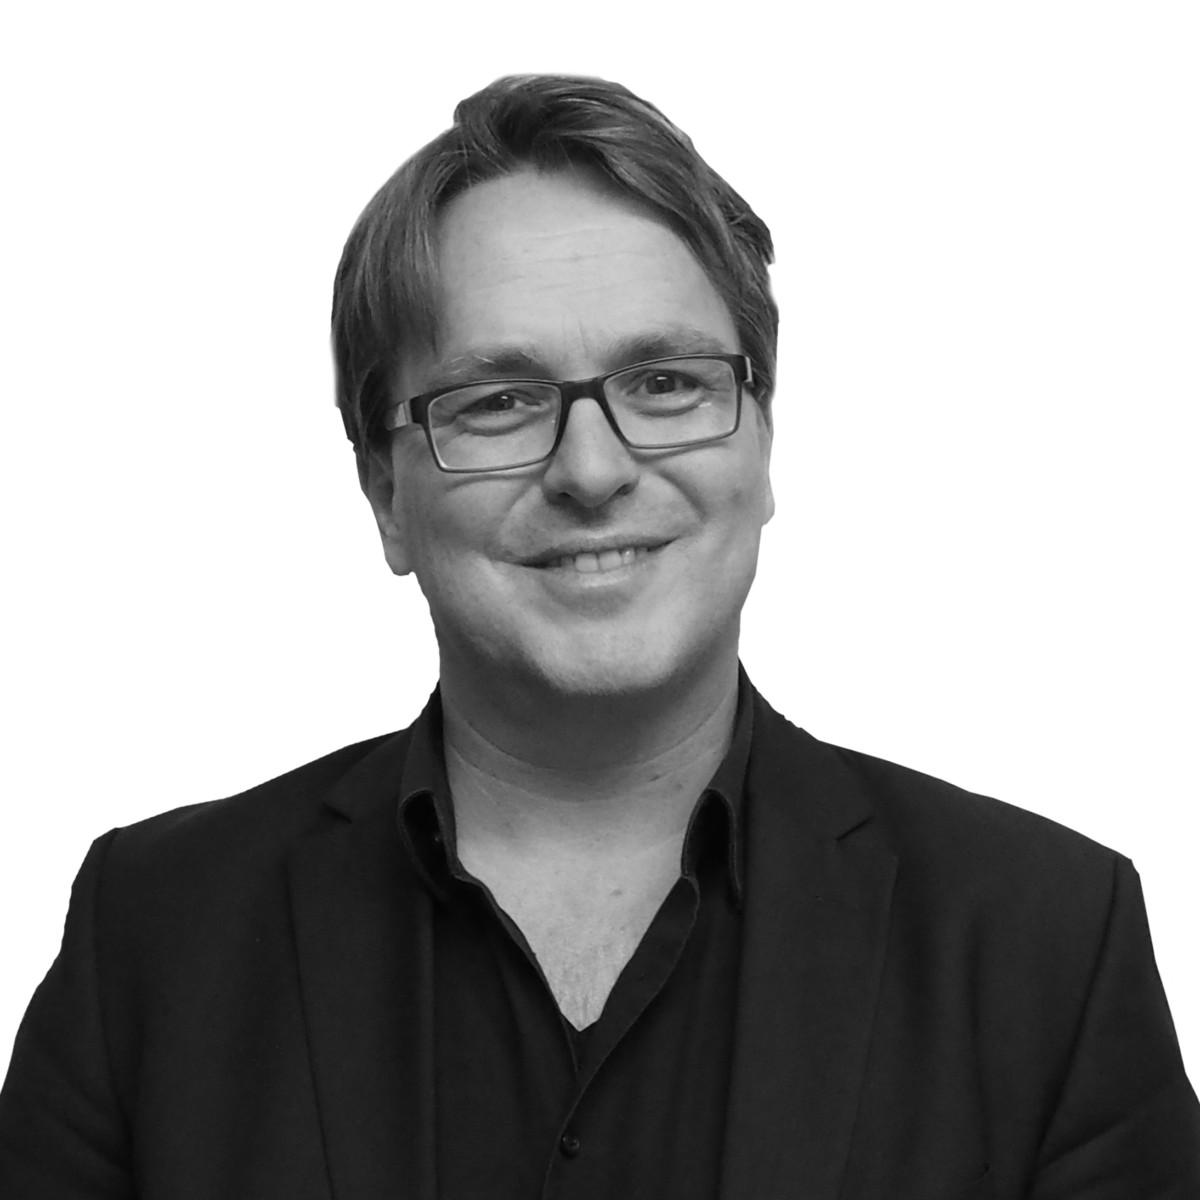 Christian Weicken